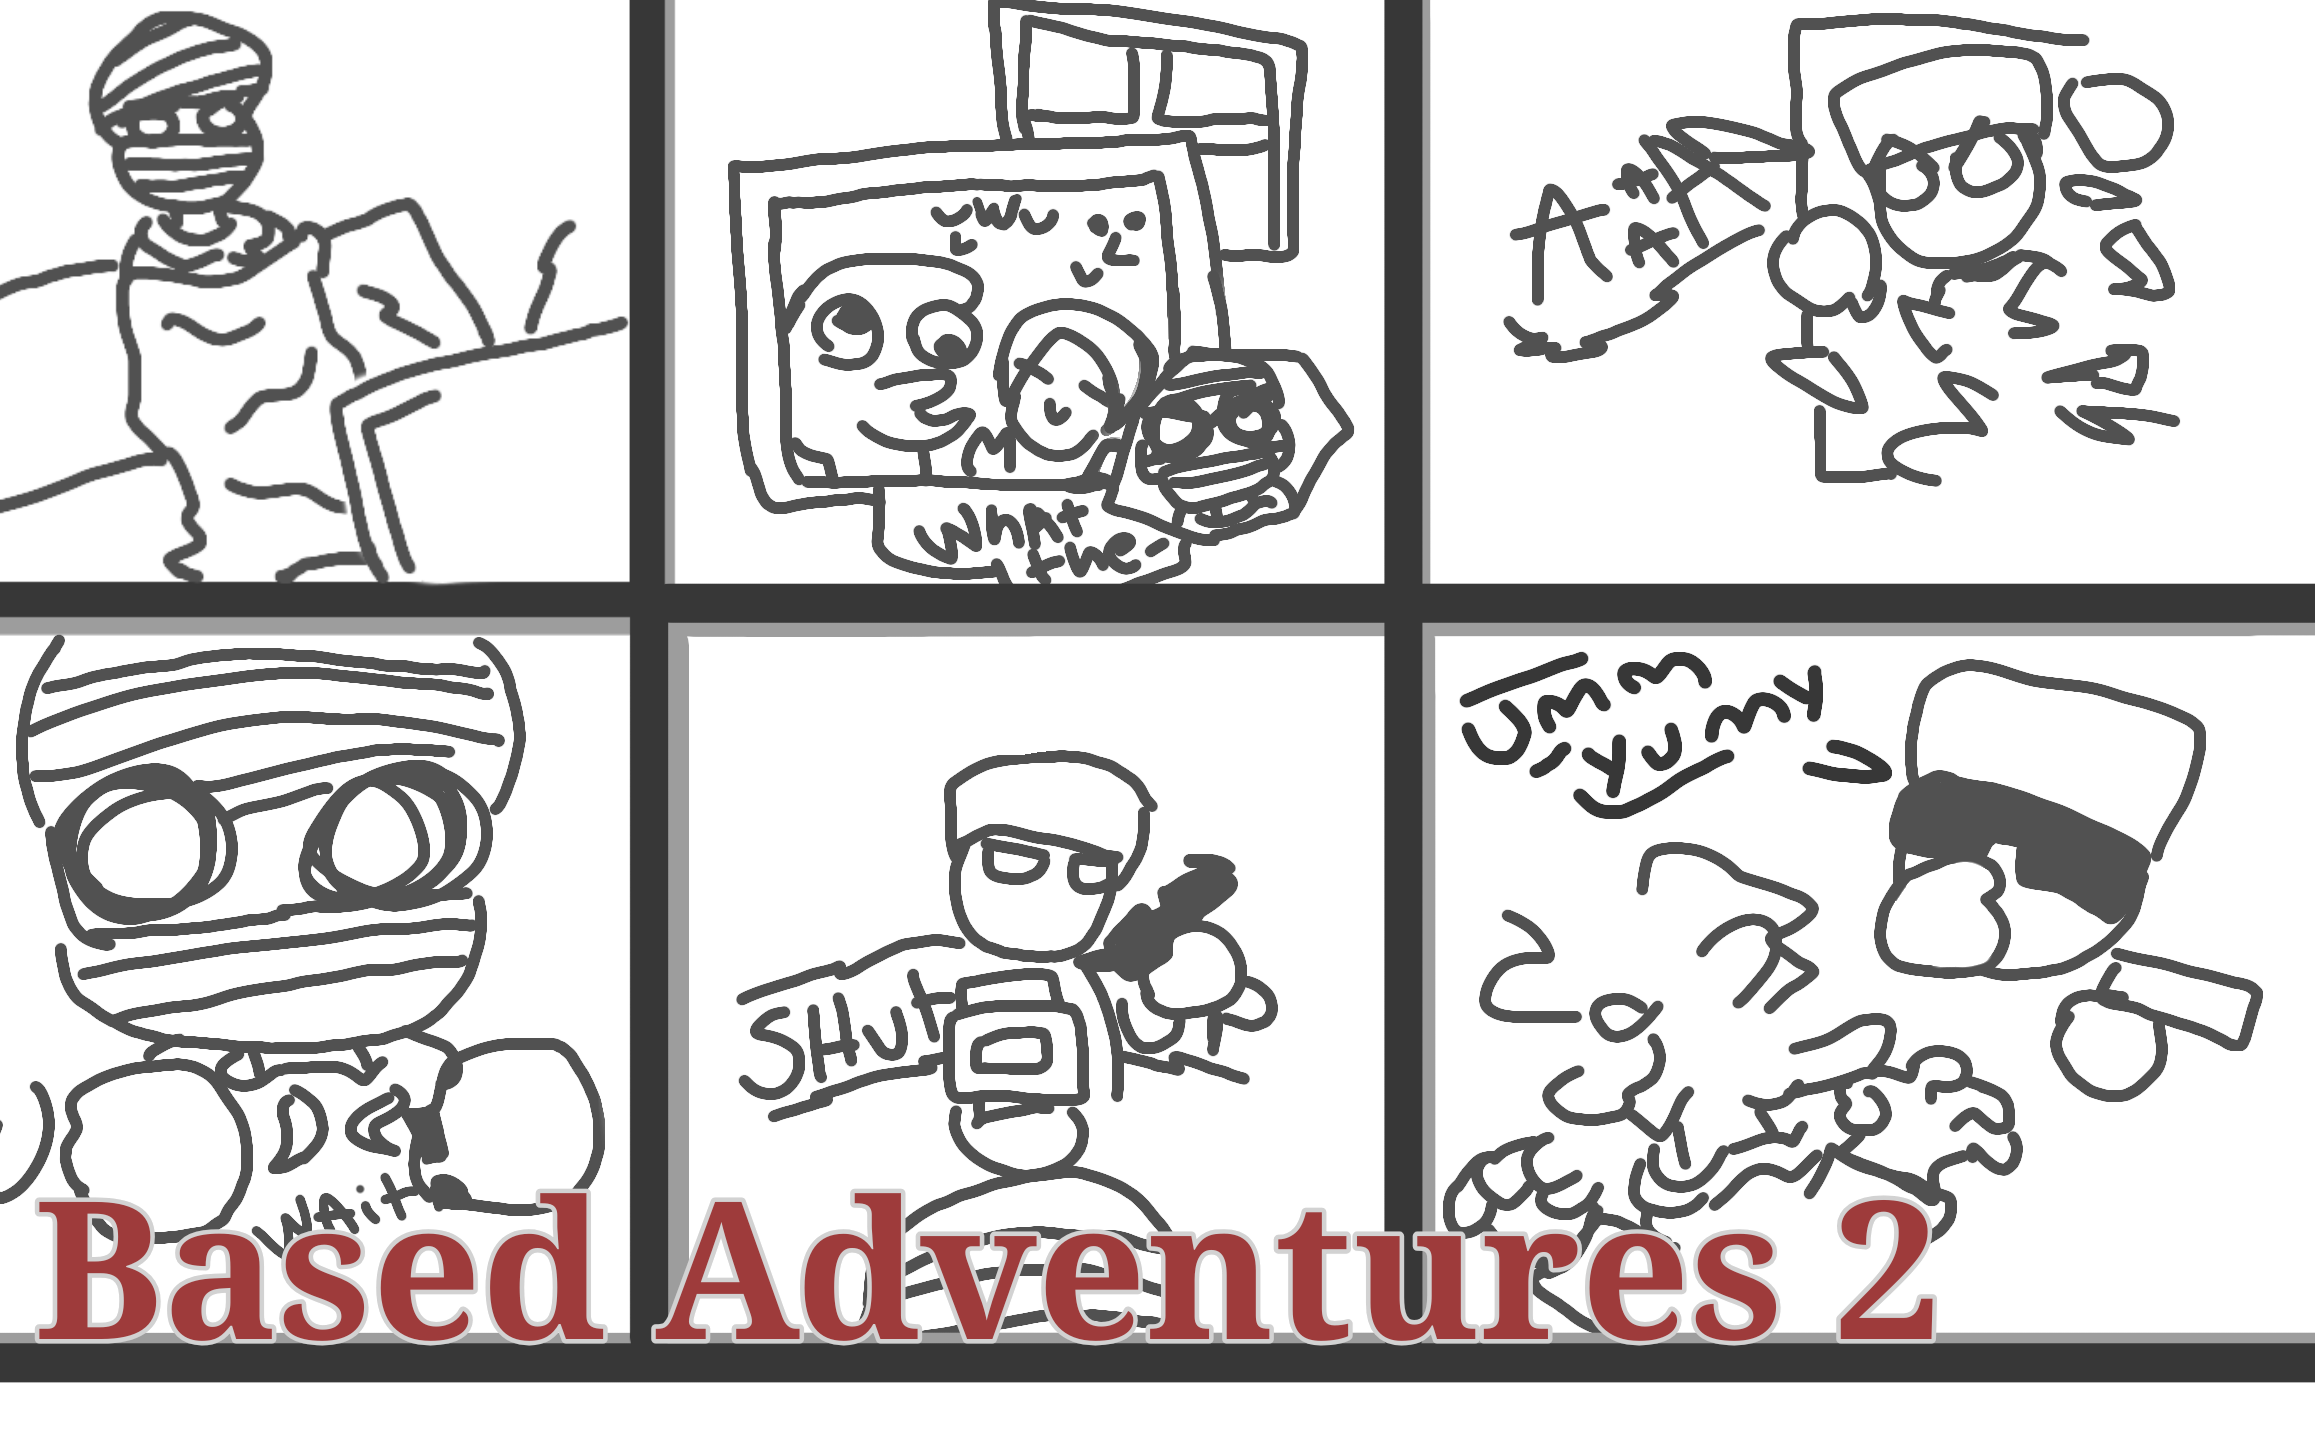 Based Adventures 2 (1.0)